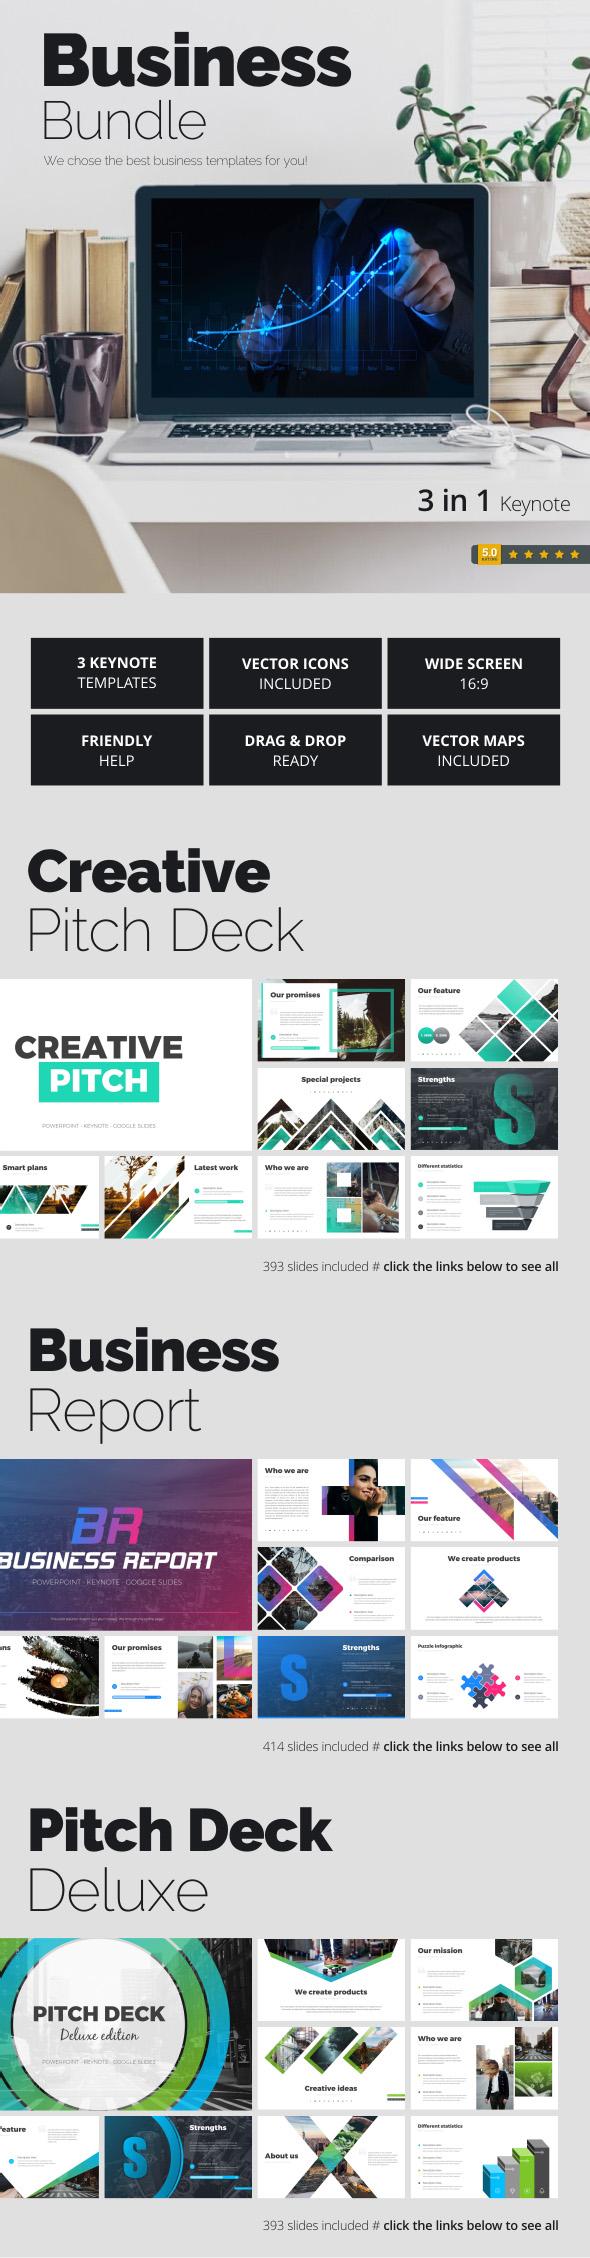 Business Bundle - Business Keynote Templates